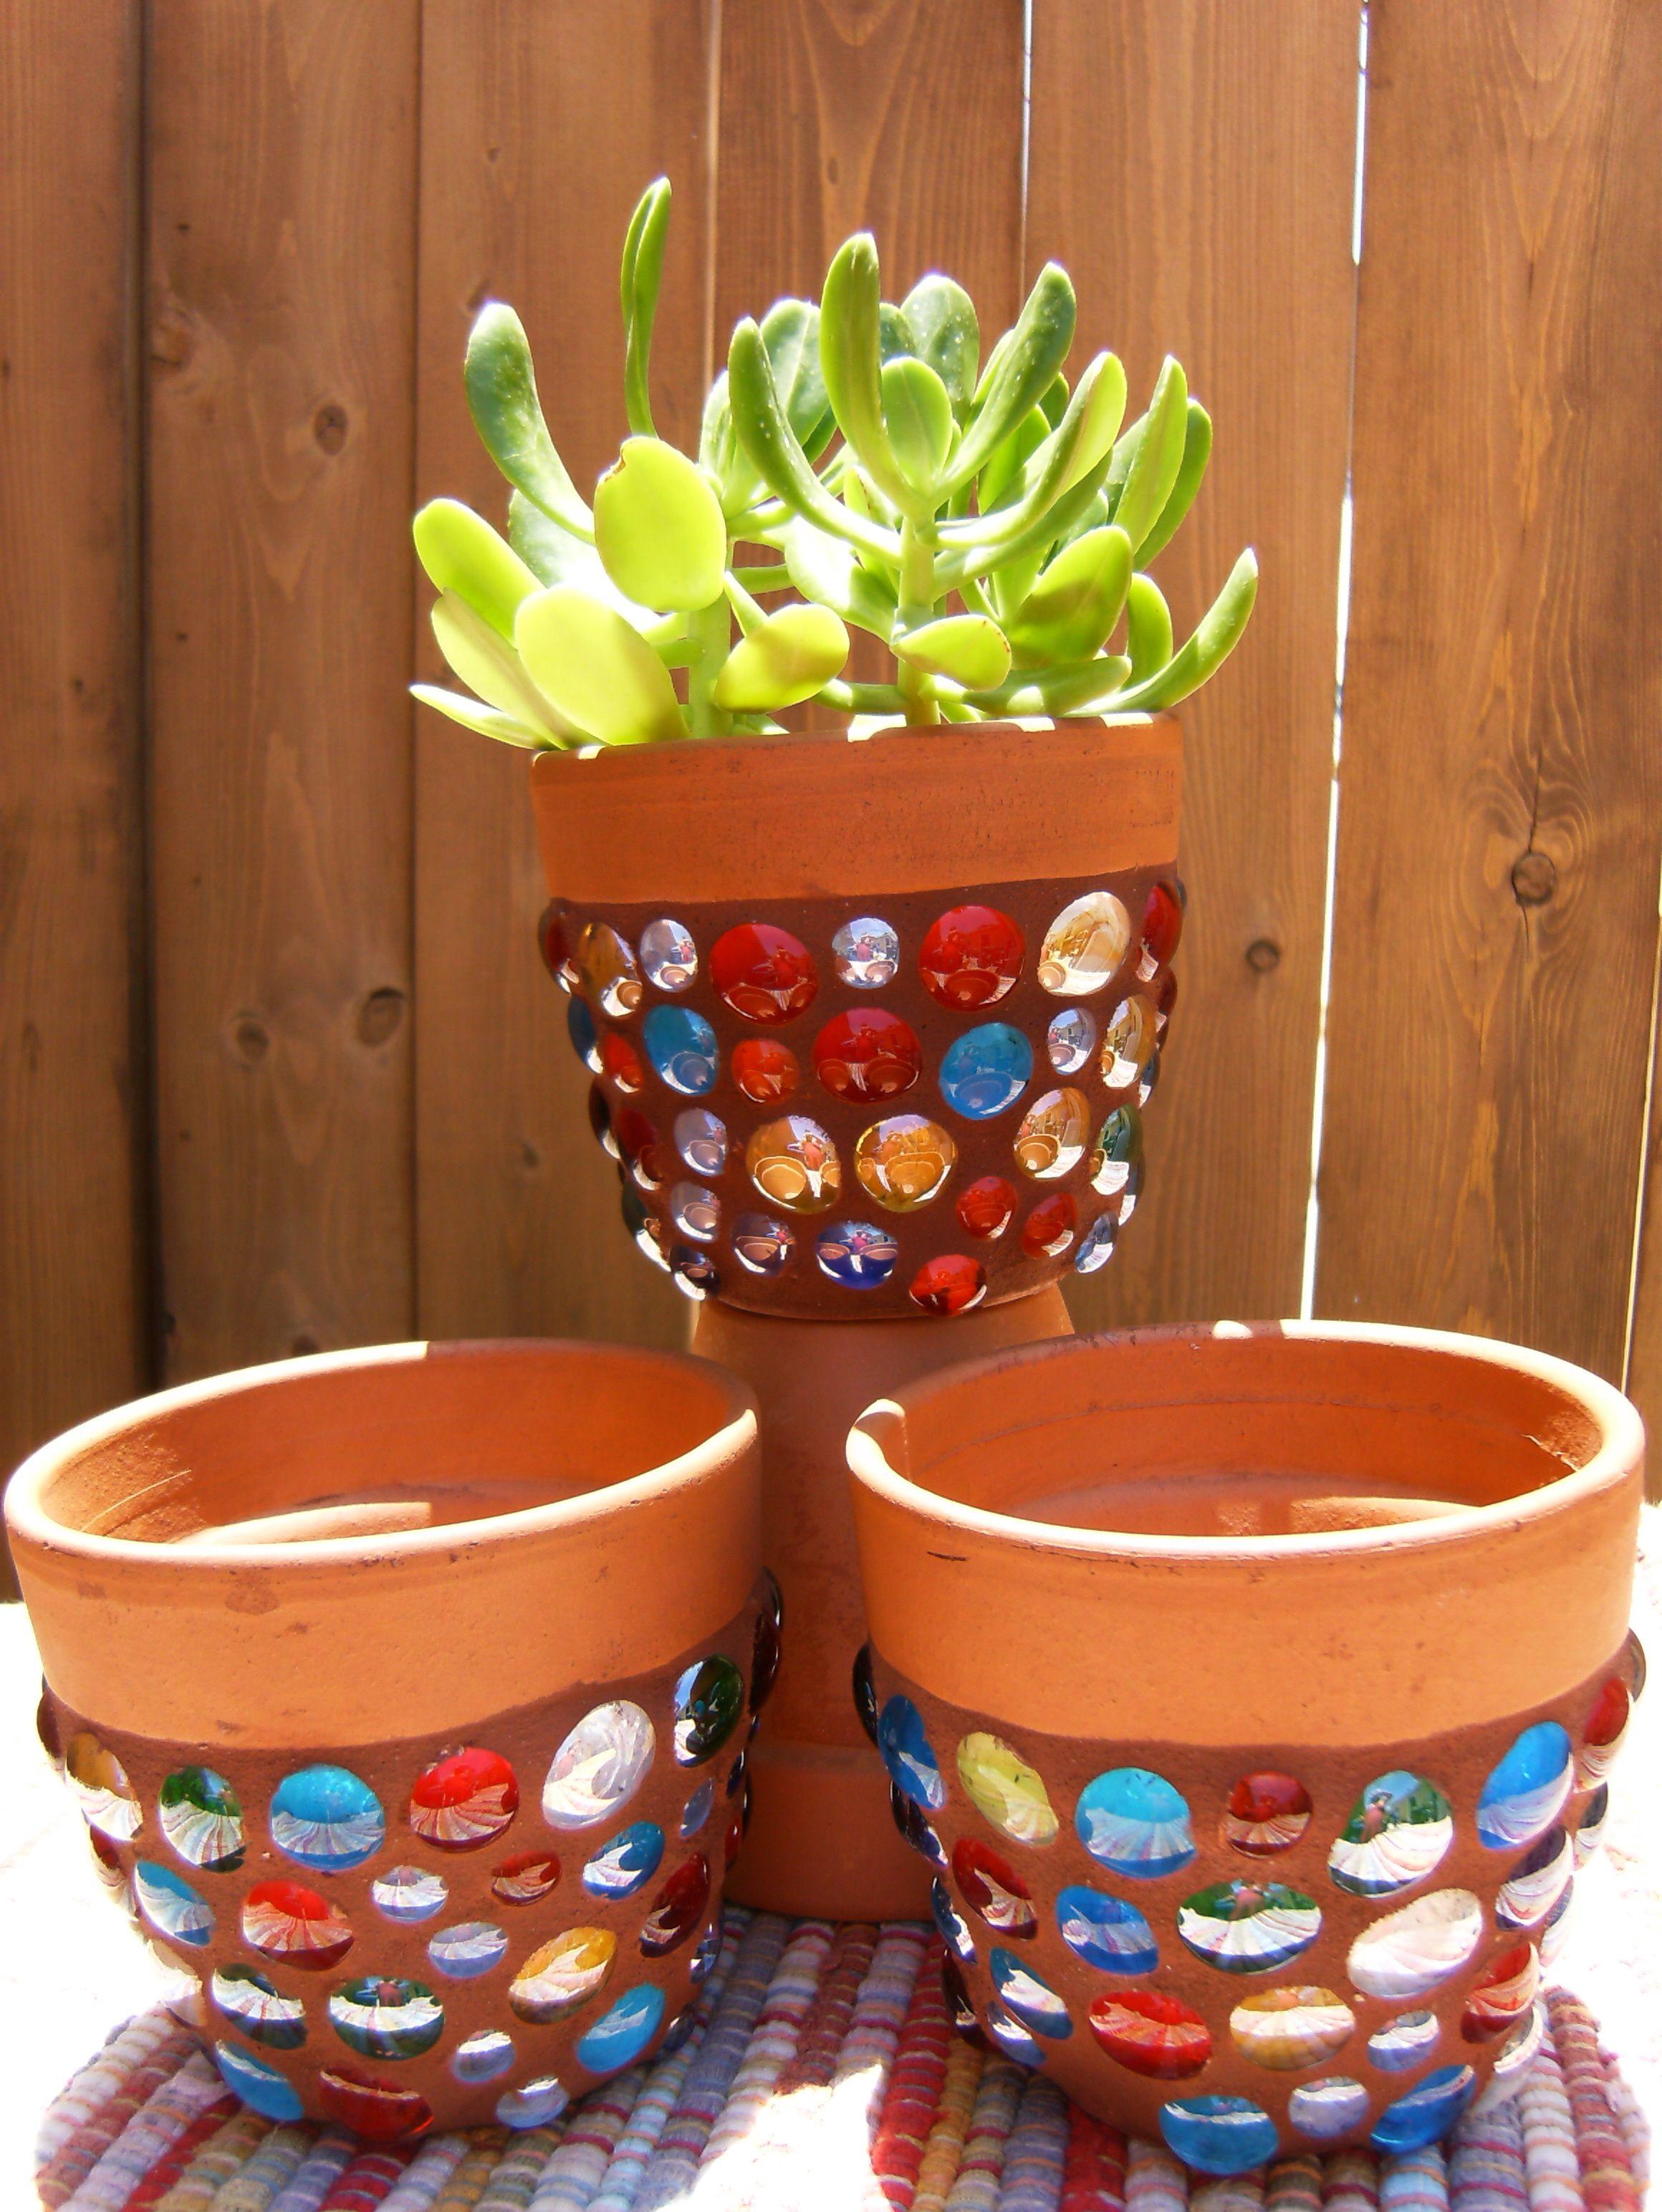 mosaic diy pot pots creative items decor glass mirror crafts clay flower mosaics easy garden terra beads cotta craft window